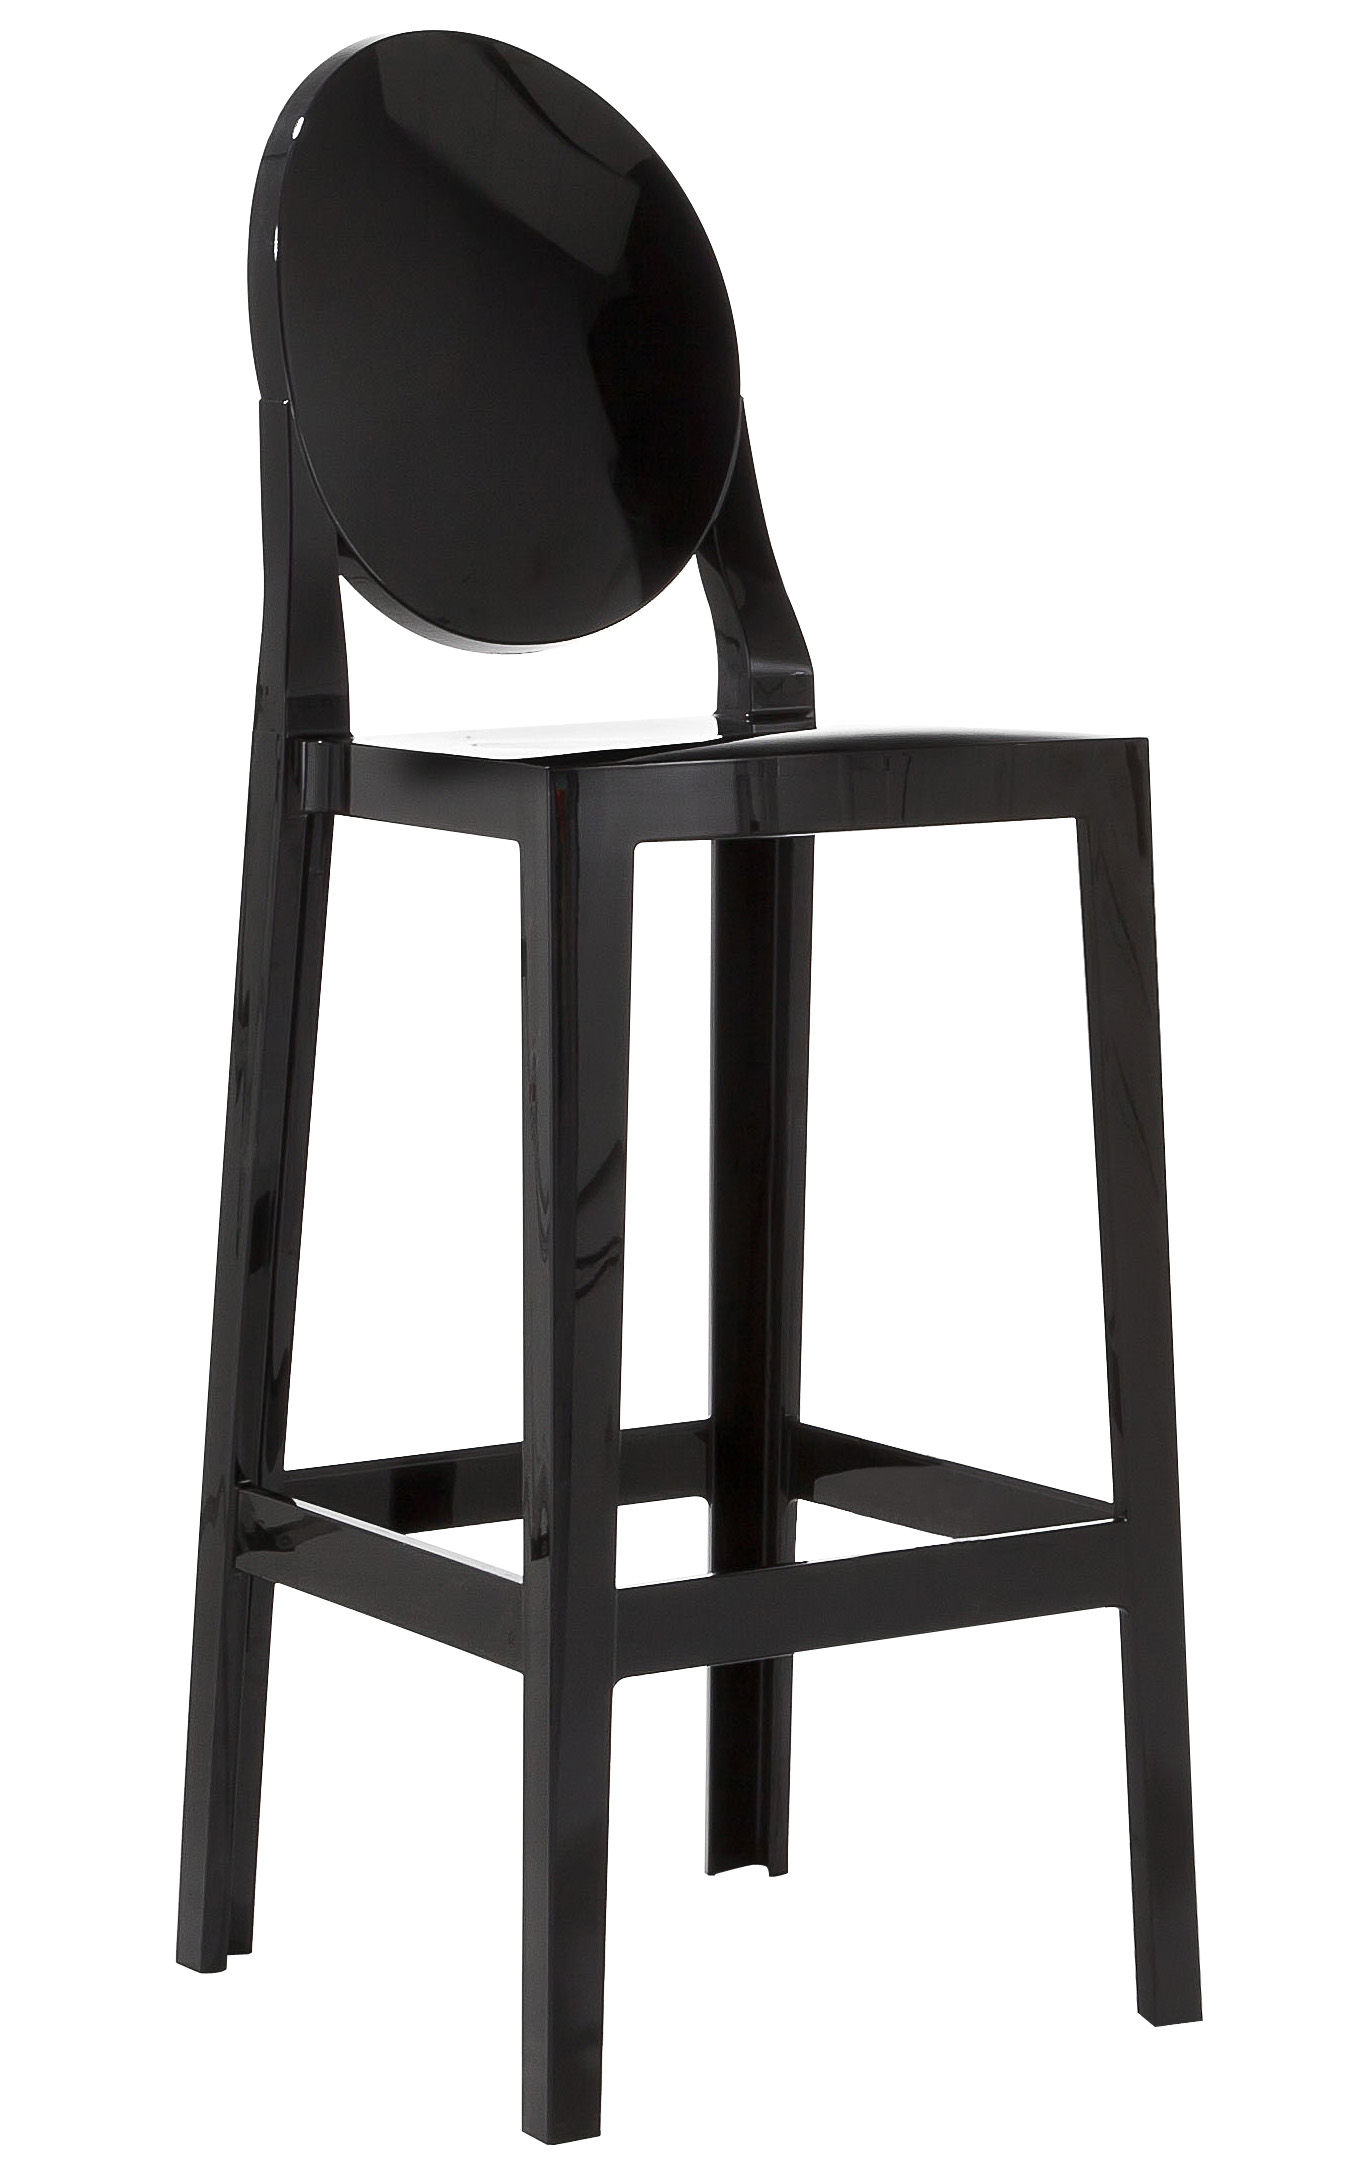 chaise de bar one more h 75cm plastique noir kartell. Black Bedroom Furniture Sets. Home Design Ideas